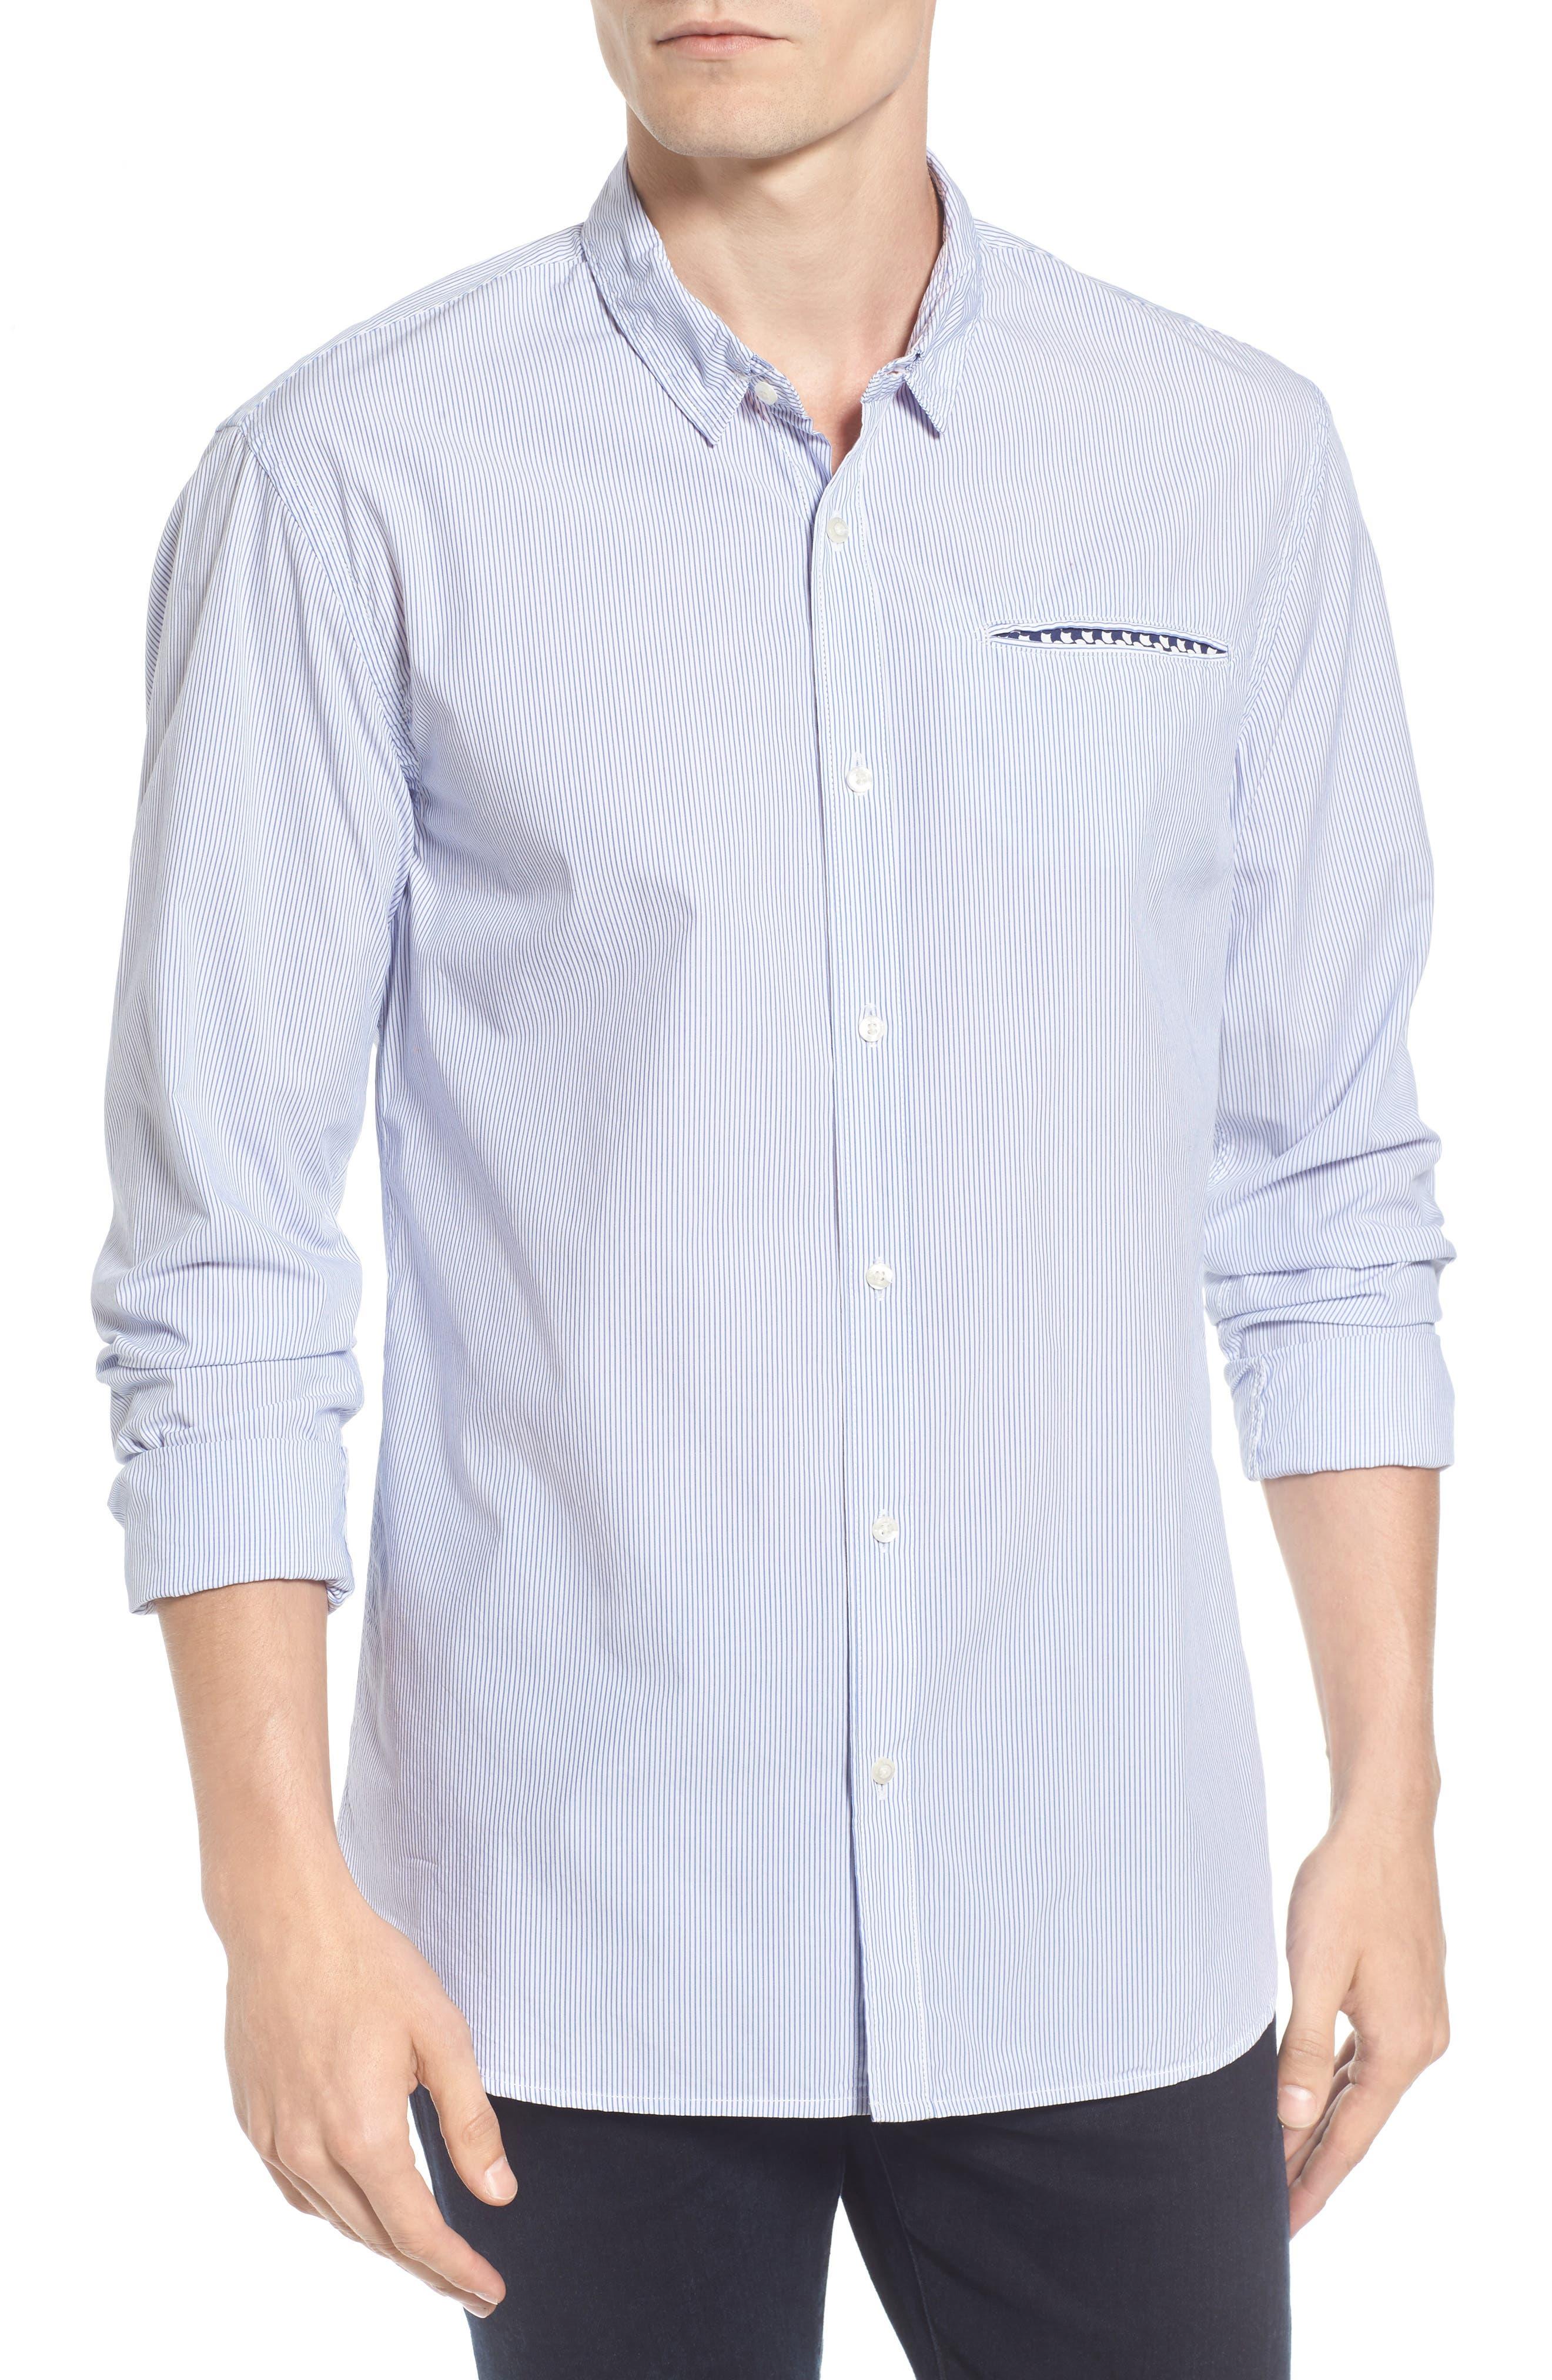 Main Image - Scotch & Soda Woven Stripe Shirt